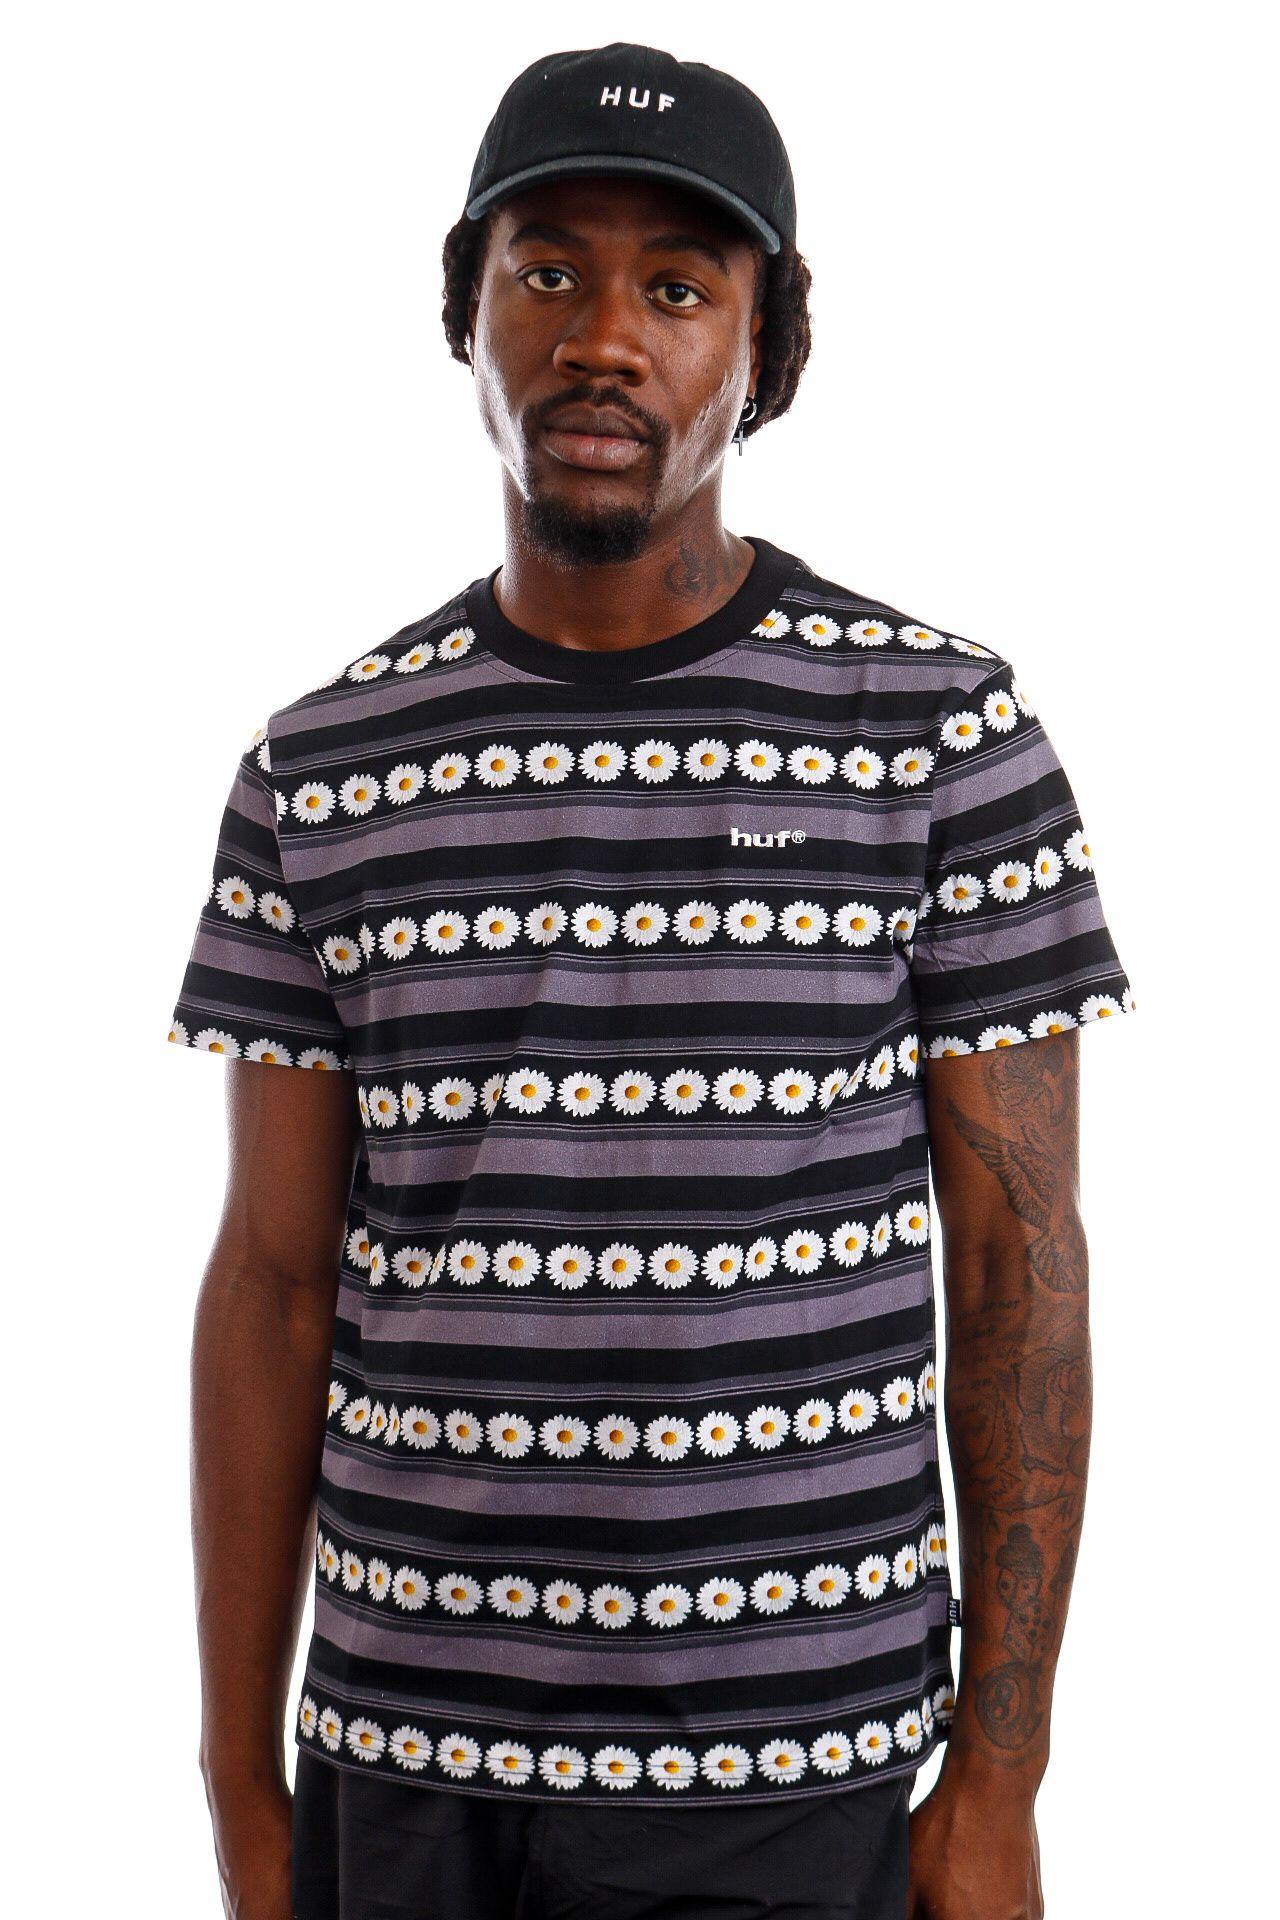 Afbeelding van HUF T-Shirt HUF DAISY STRIPE S/S KNIT Black KN00290